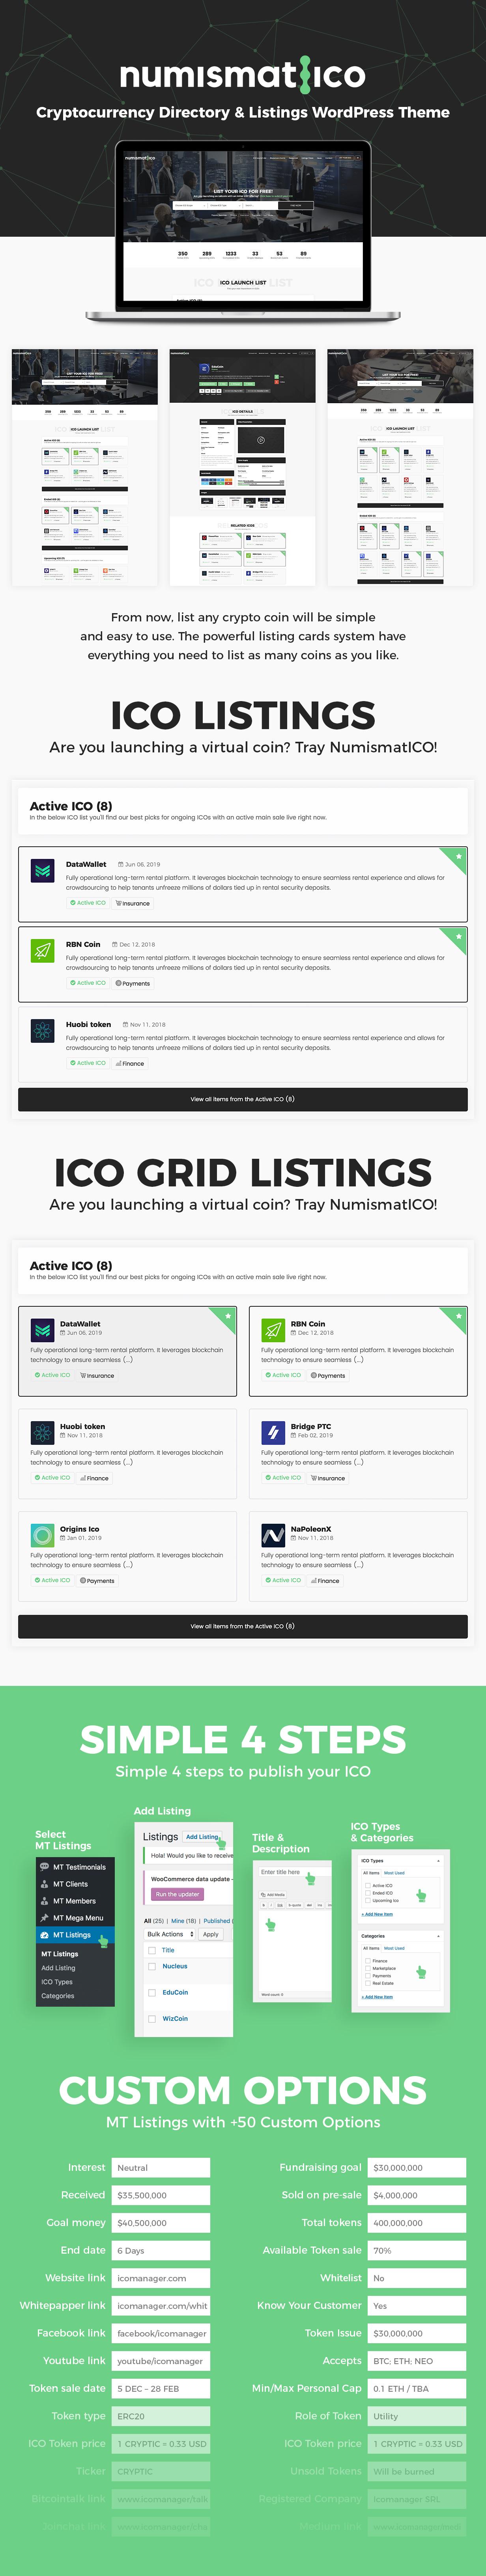 Numismatico - Cryptocurrency Directory & Listings WordPress Theme - 8